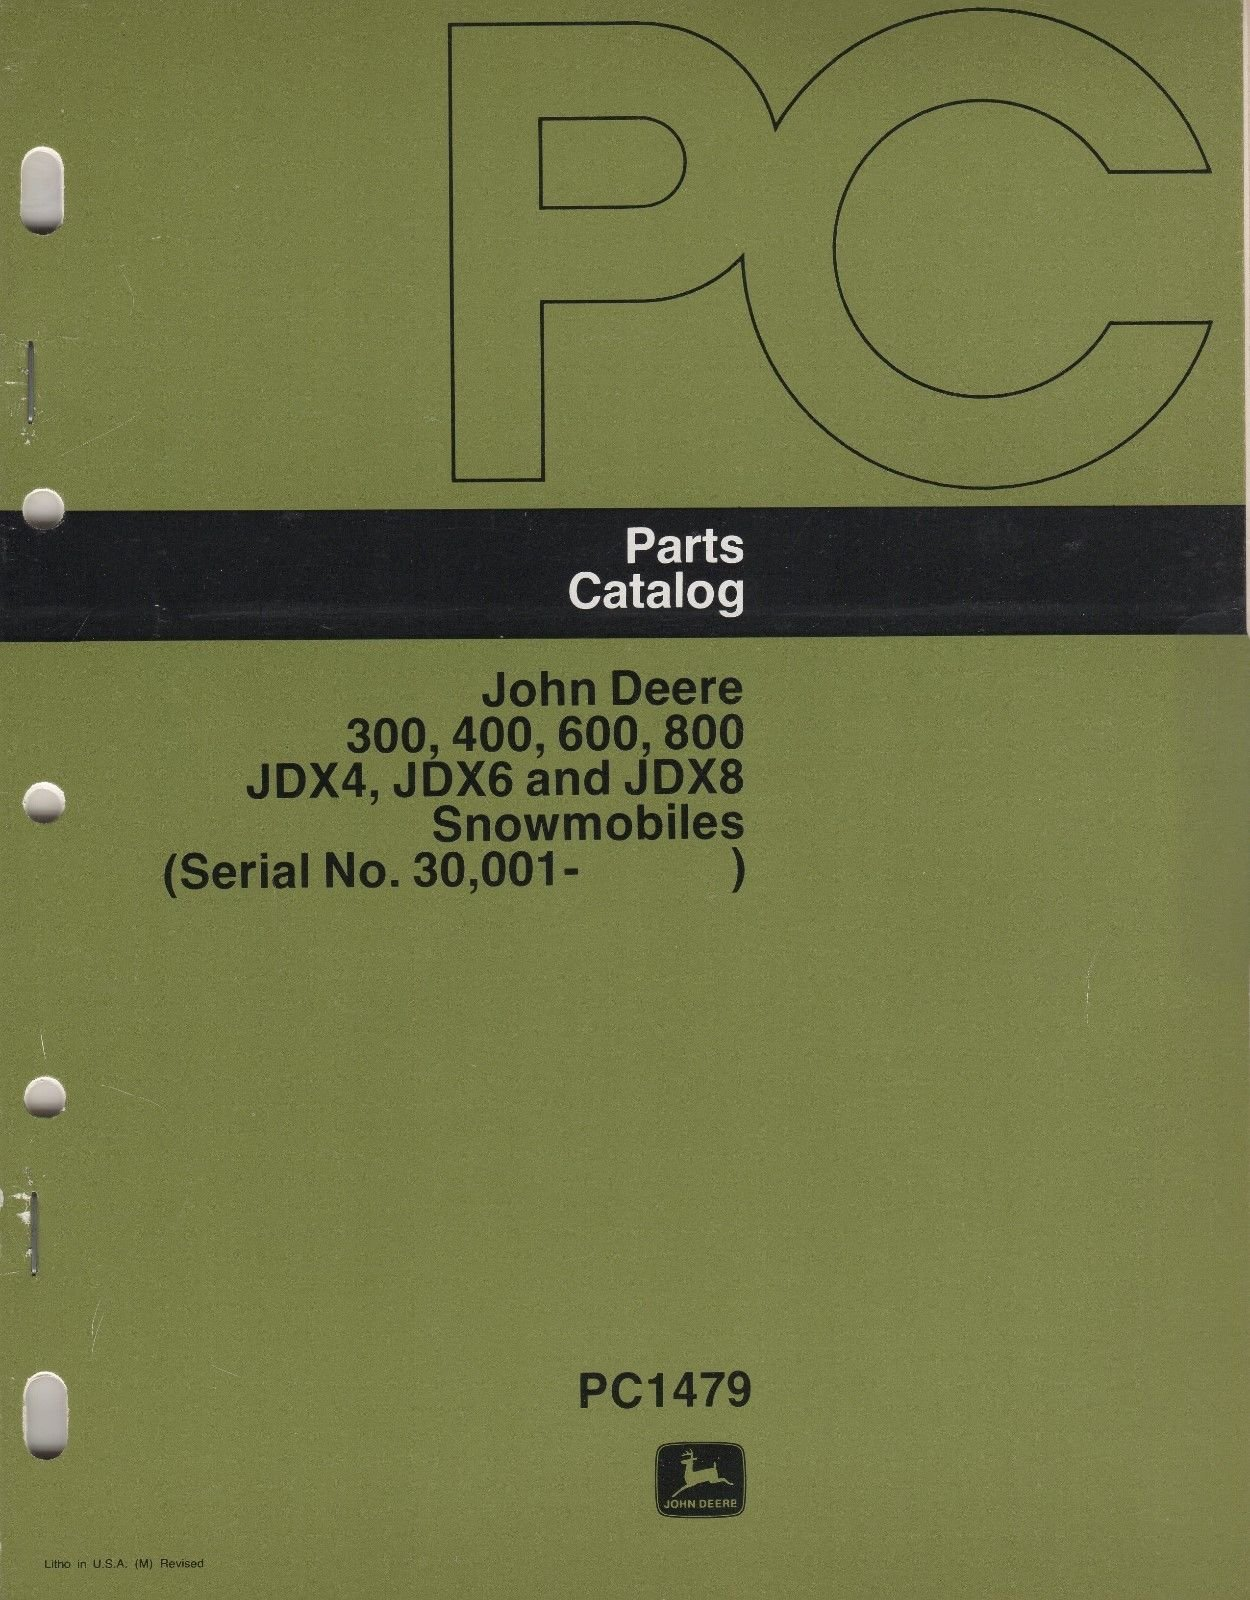 John Deere Snowmobile Engine Diagram Electrical Wiring Diagrams Lx188 1975 1976 300 400 600 800 Jdx4 X6 X8 Parts X300